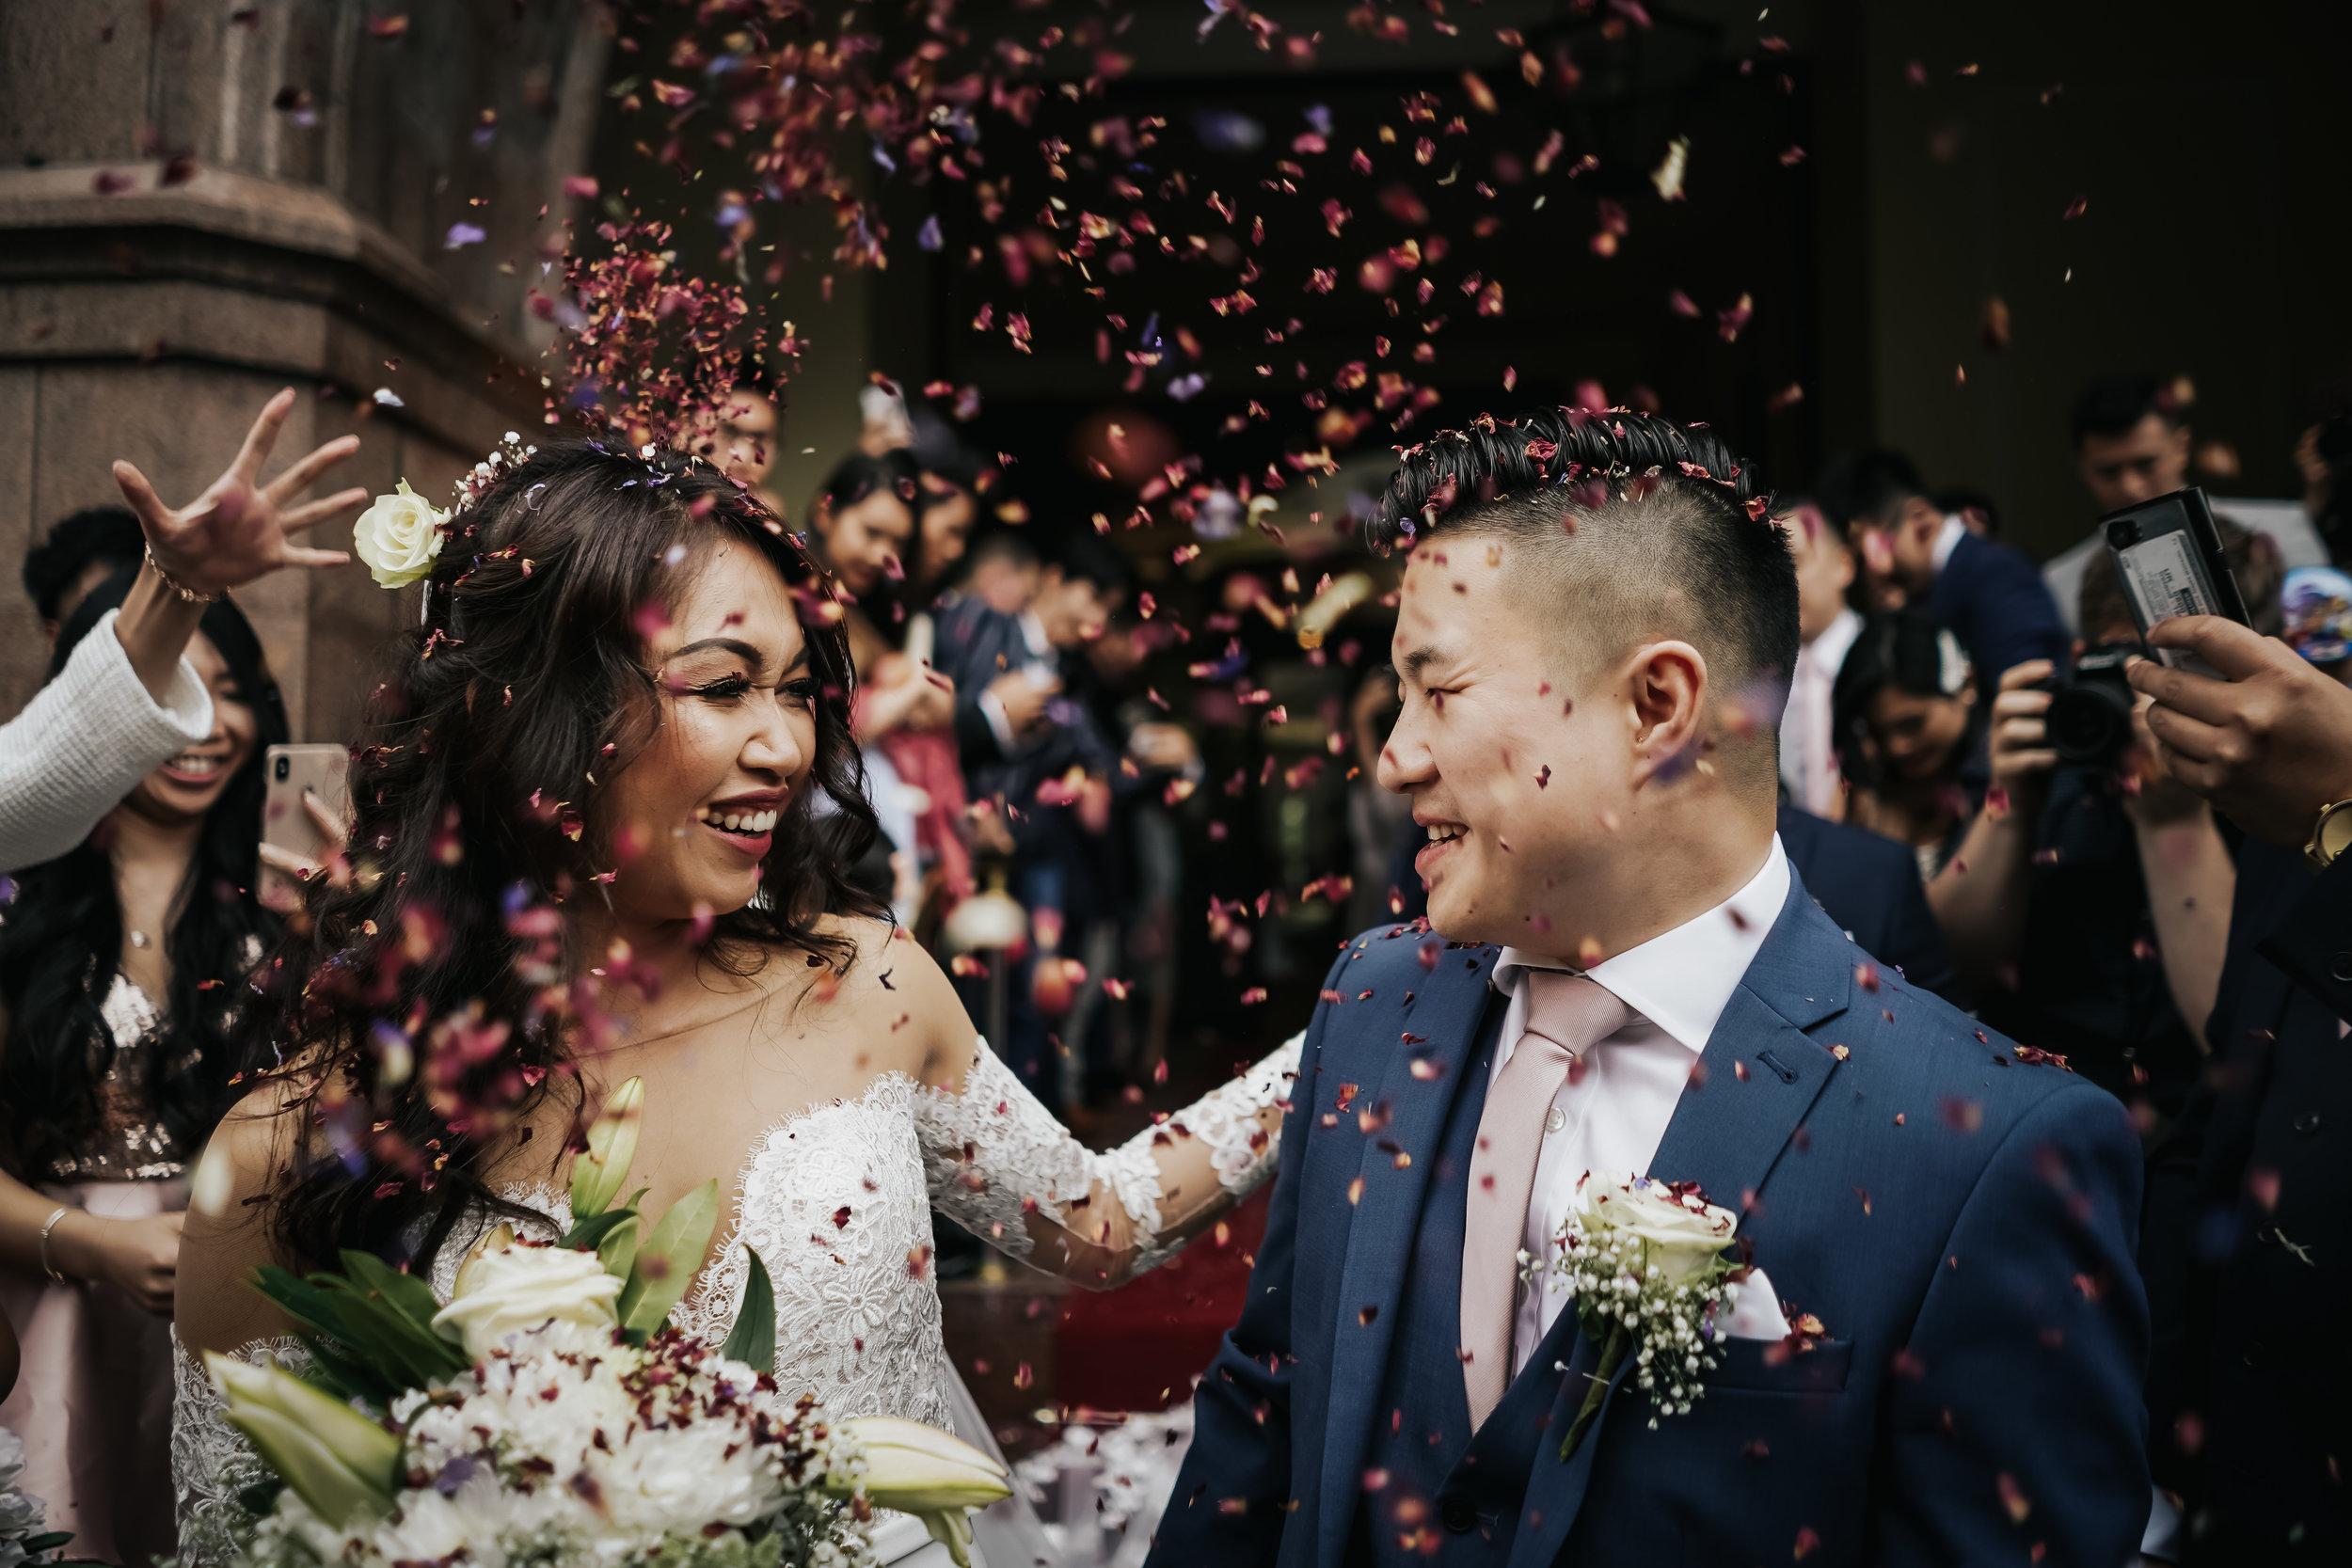 Chinese Wedding Photography Manchester wedding photographer Cheshire - 021.jpg